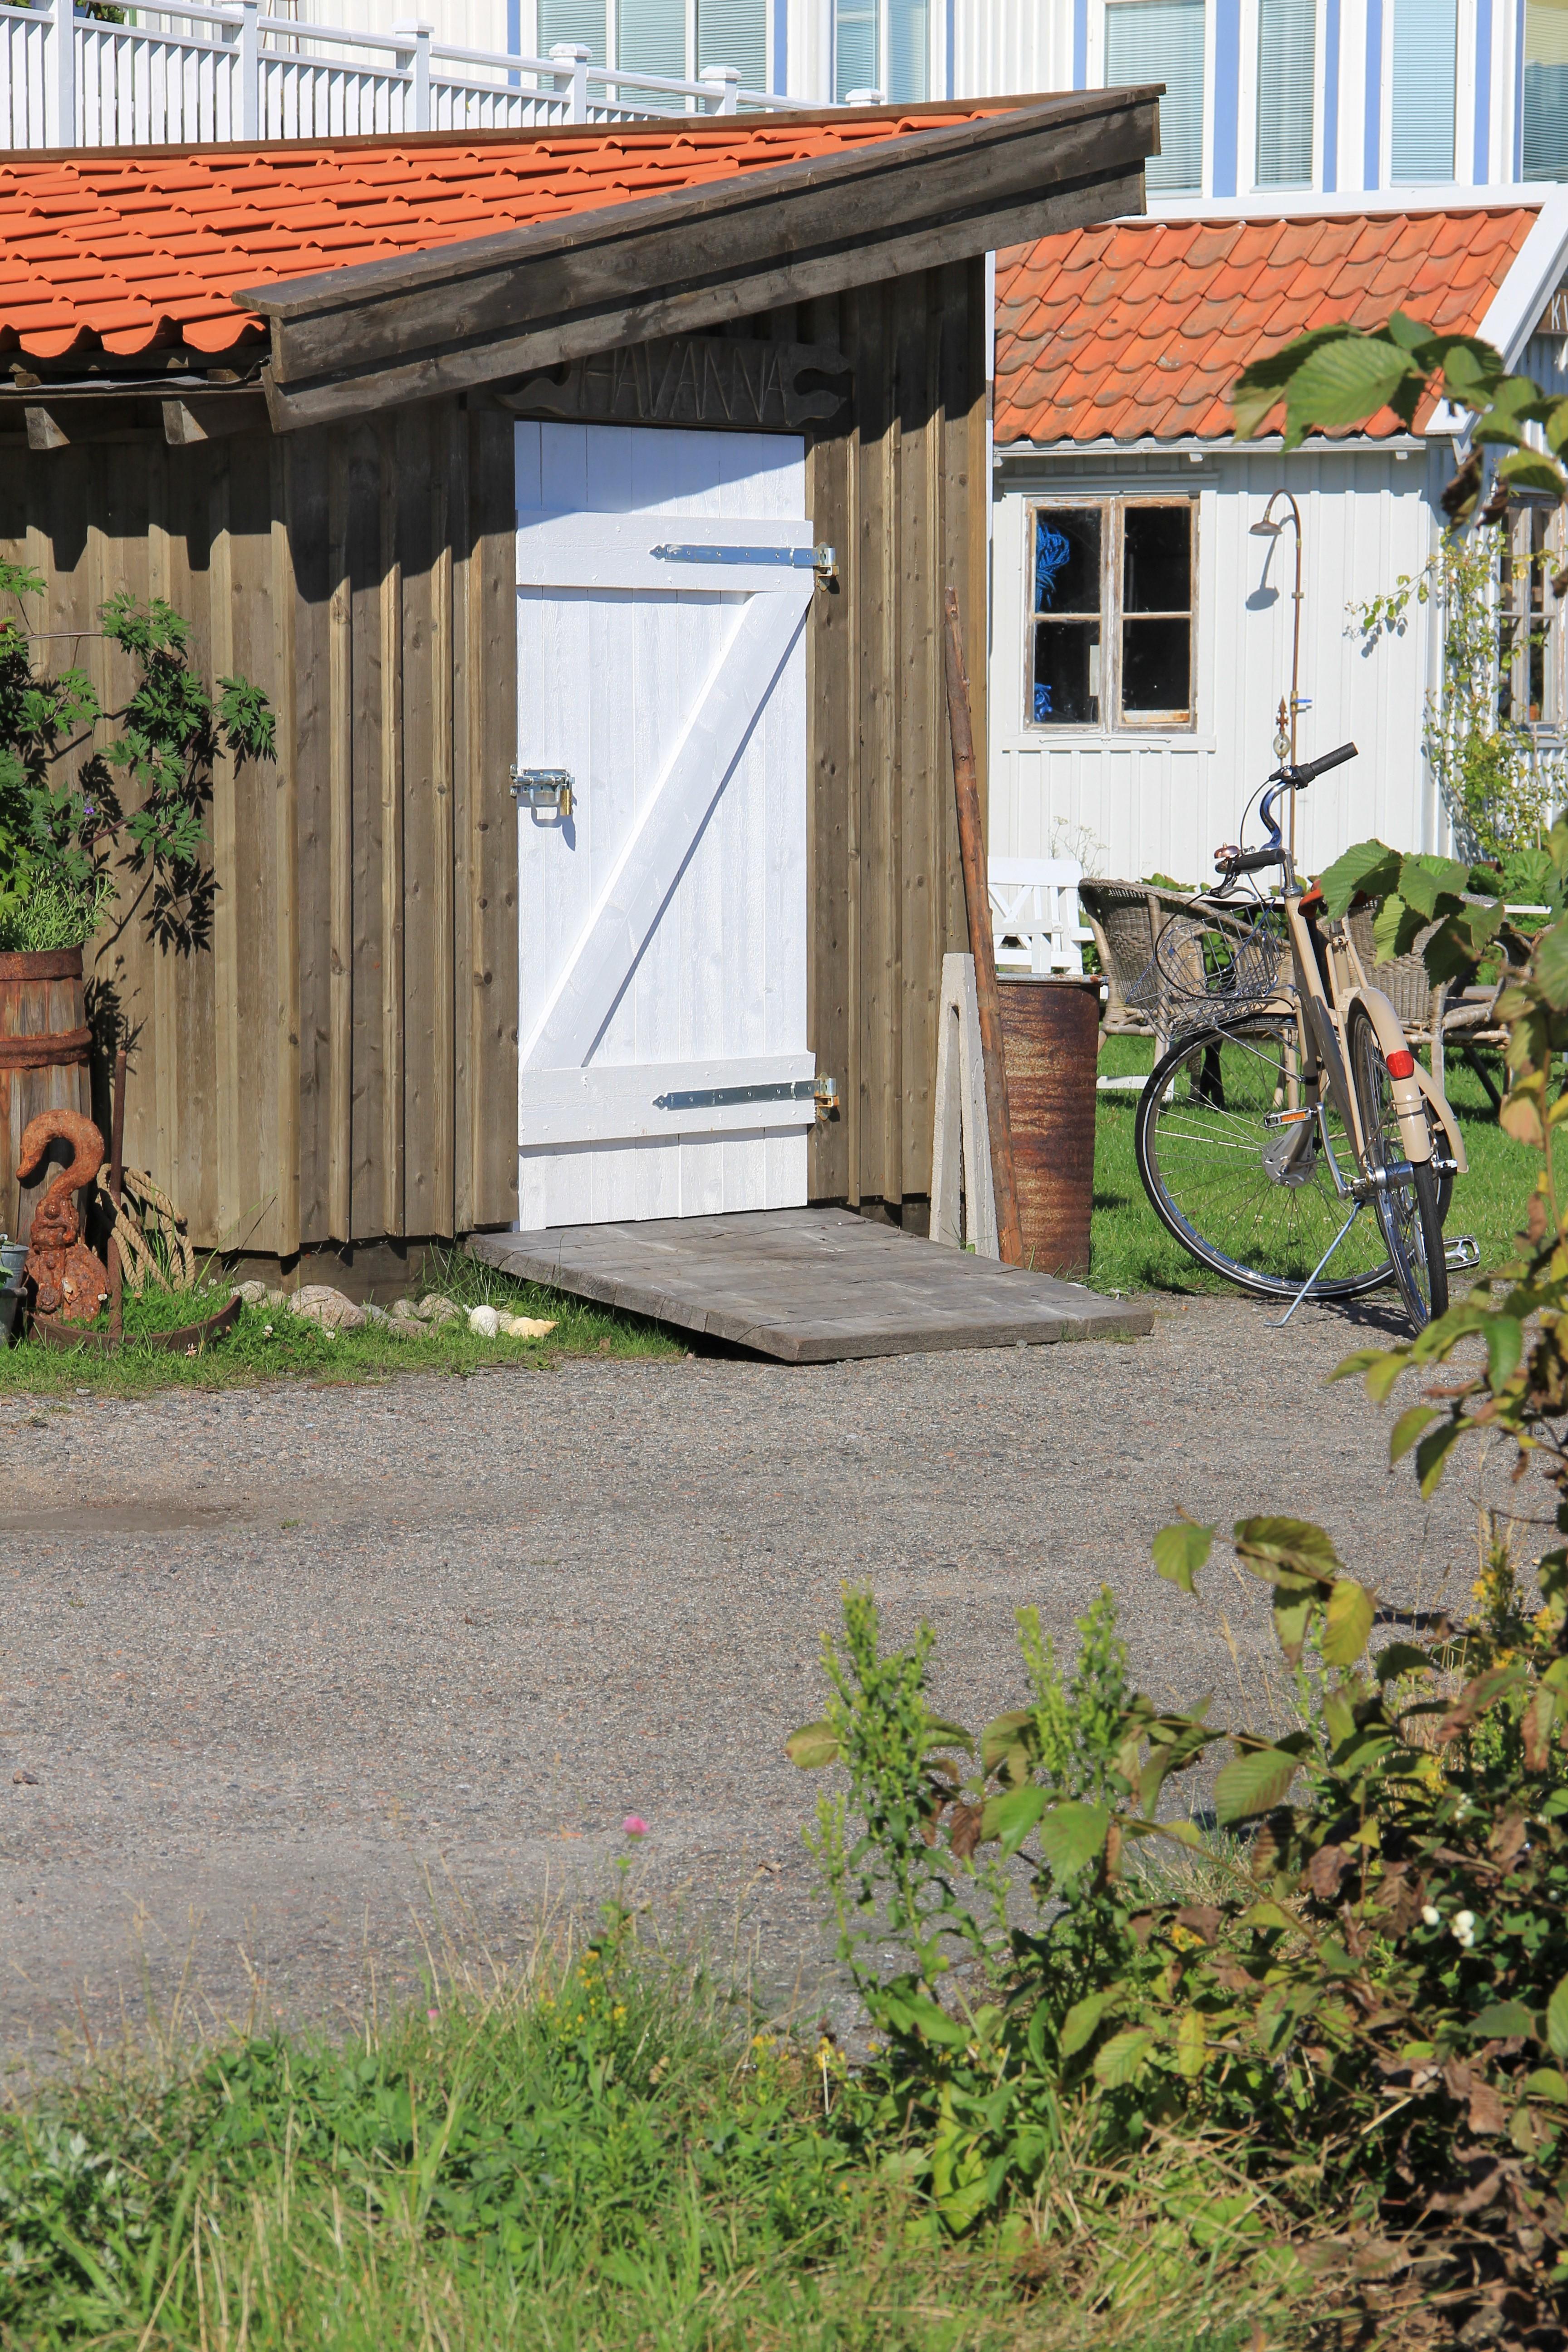 Gårdshus_02_elsapahalso